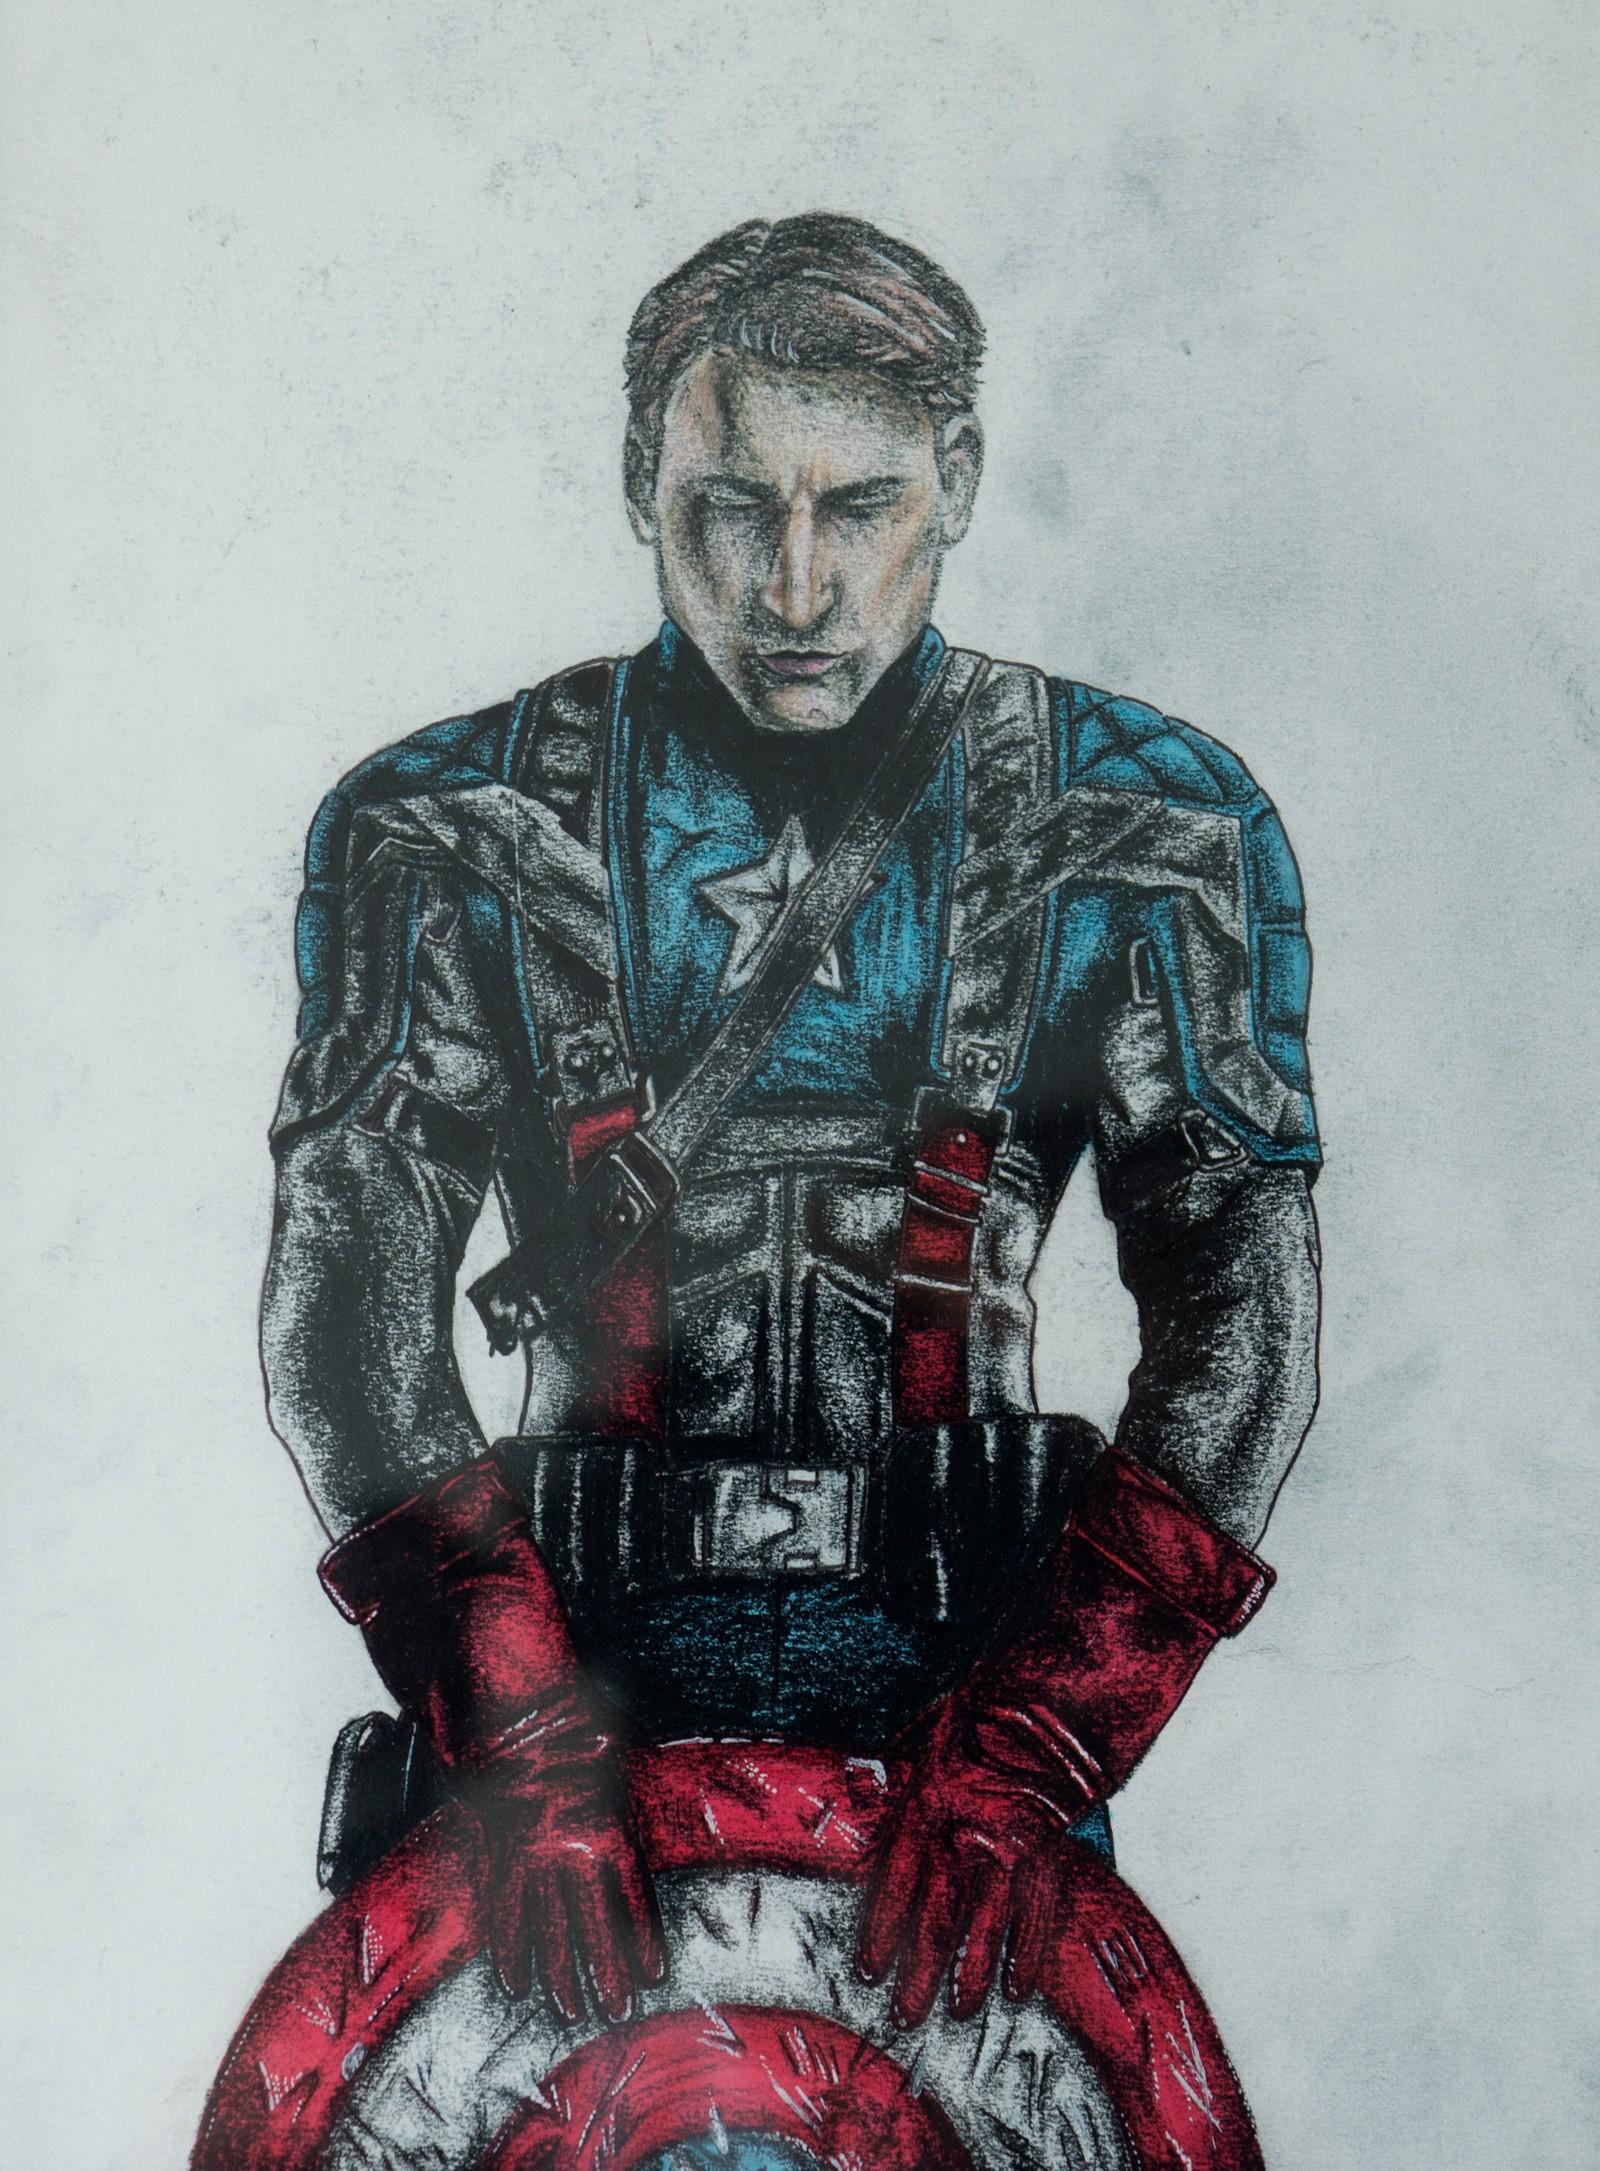 Captain America - Sara Strandheim Forfod, Høyanger